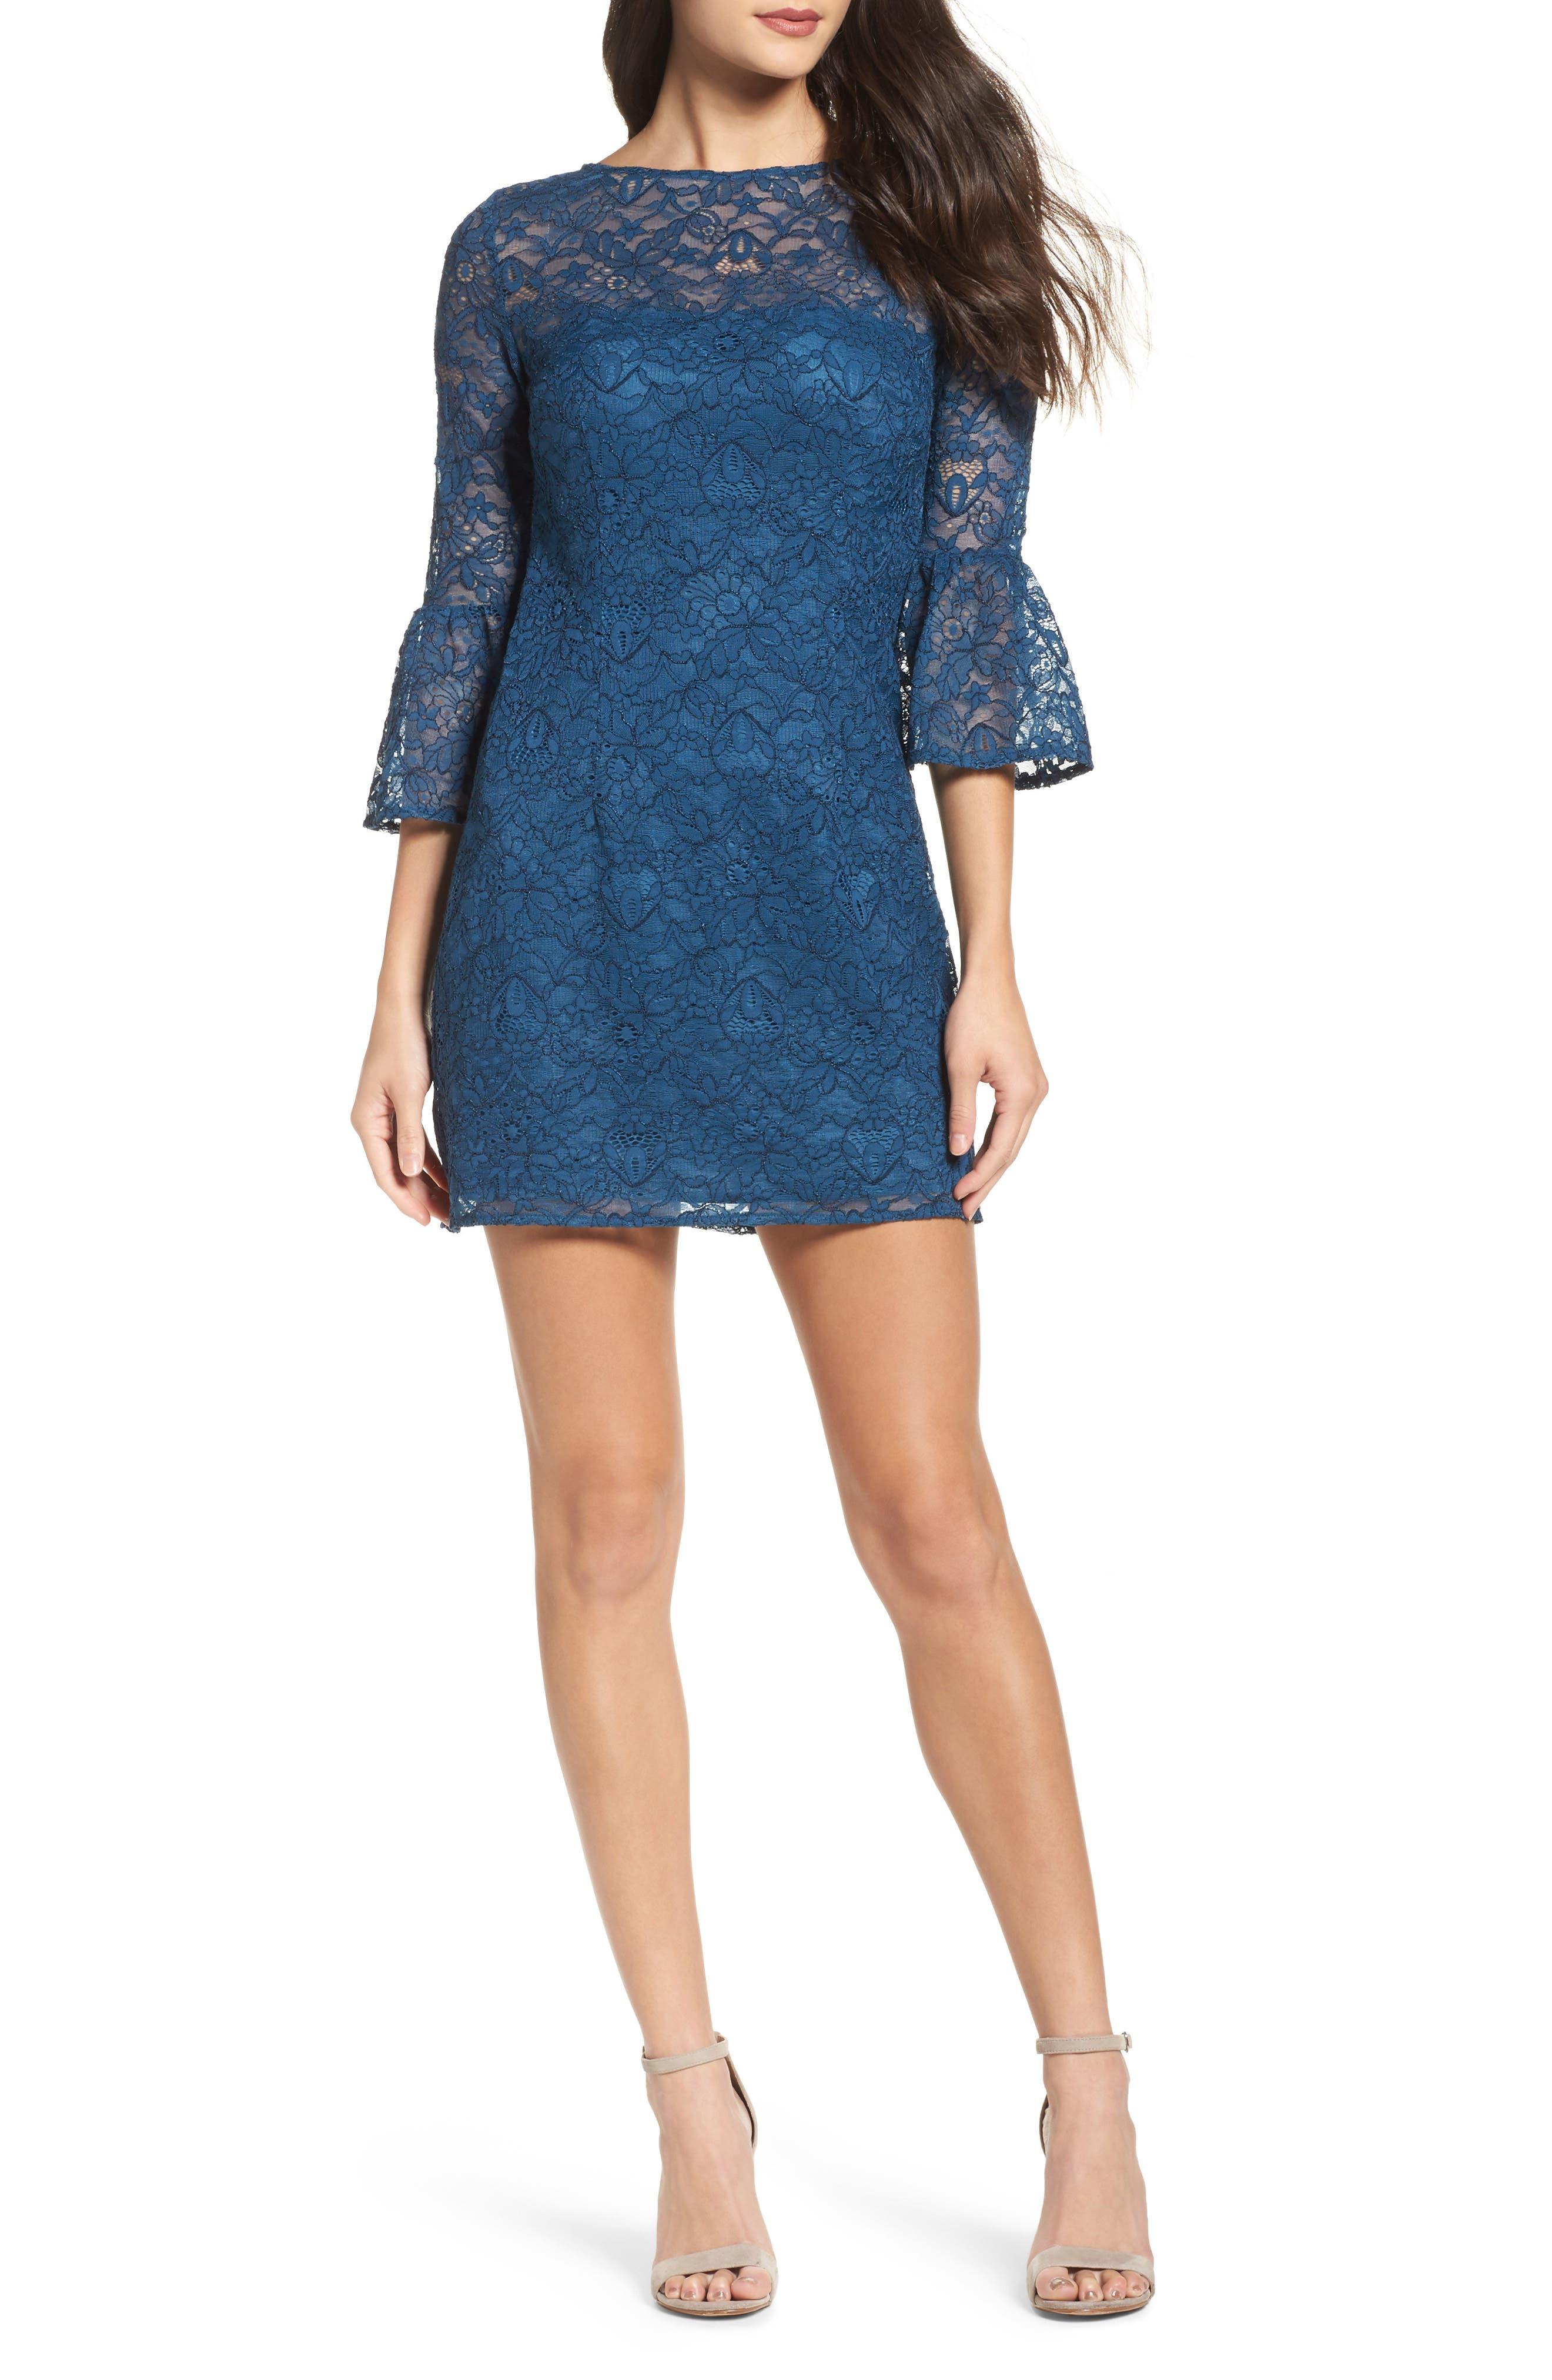 Alternate Image 1 Selected - BB Dakota Billie Bell Sleeve Lace Dress